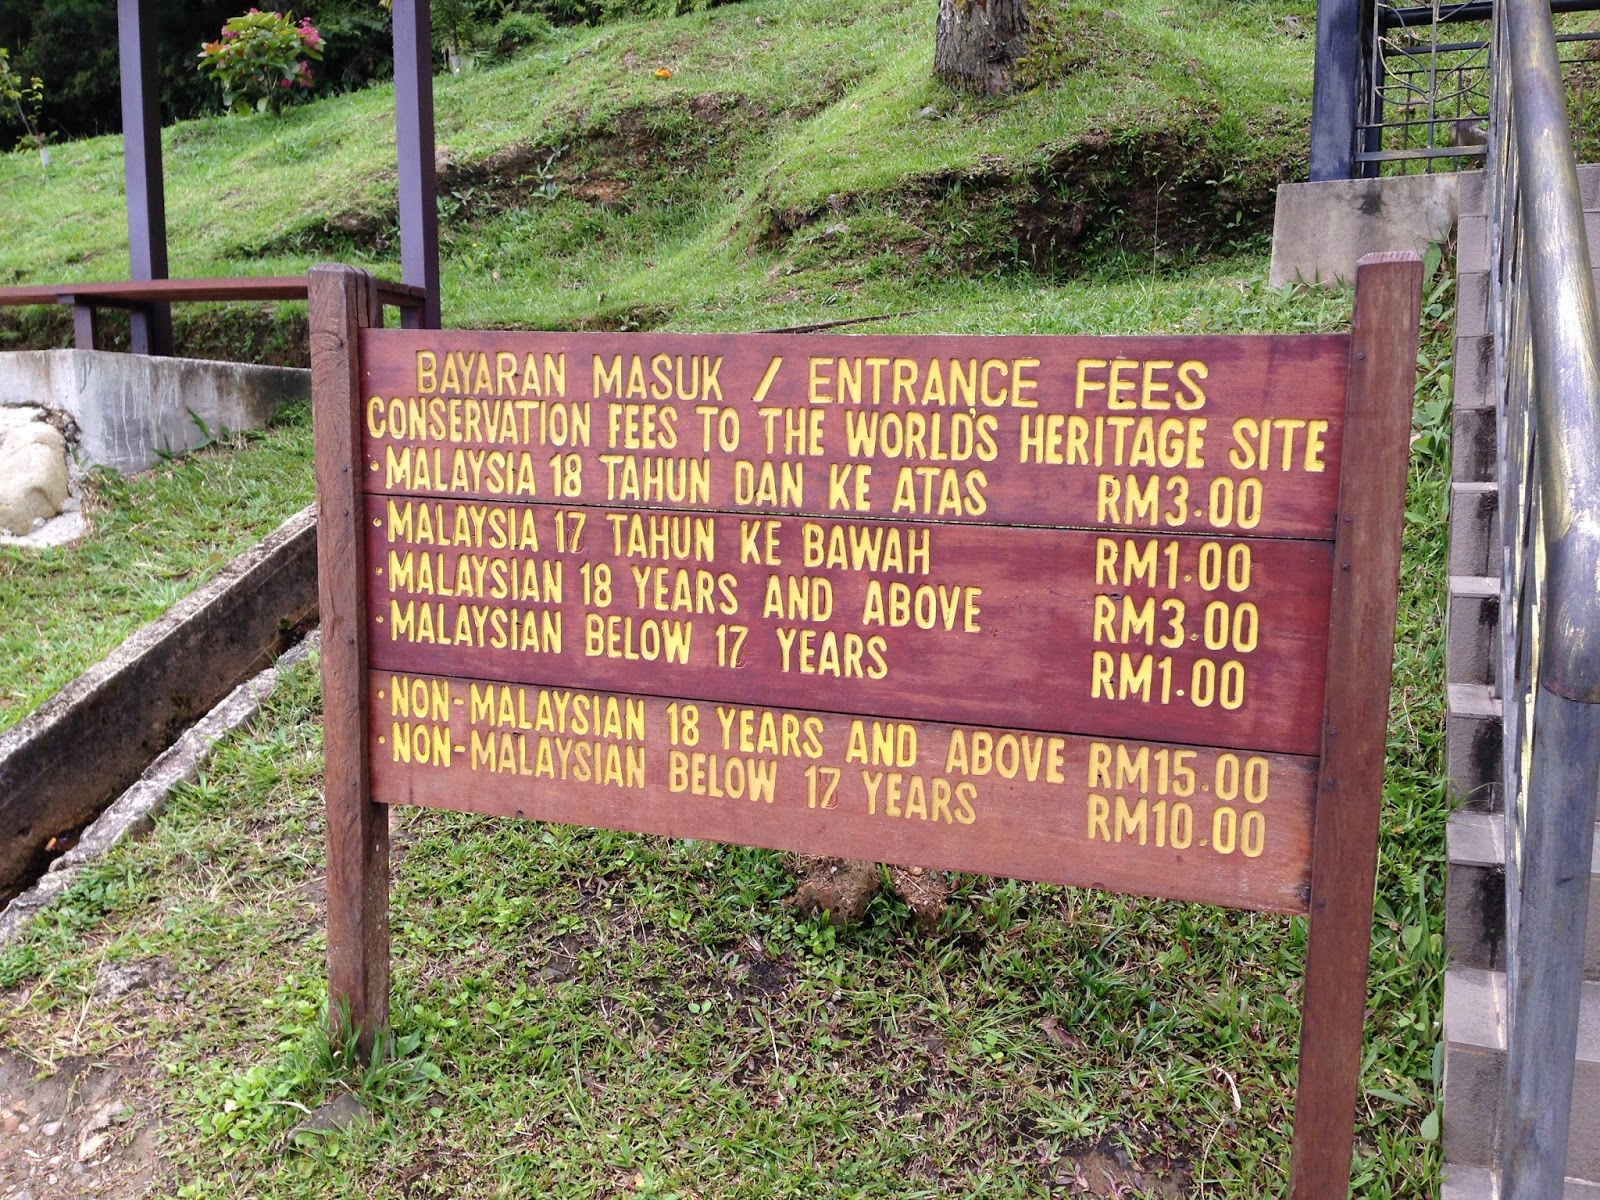 Park Entrance Fee